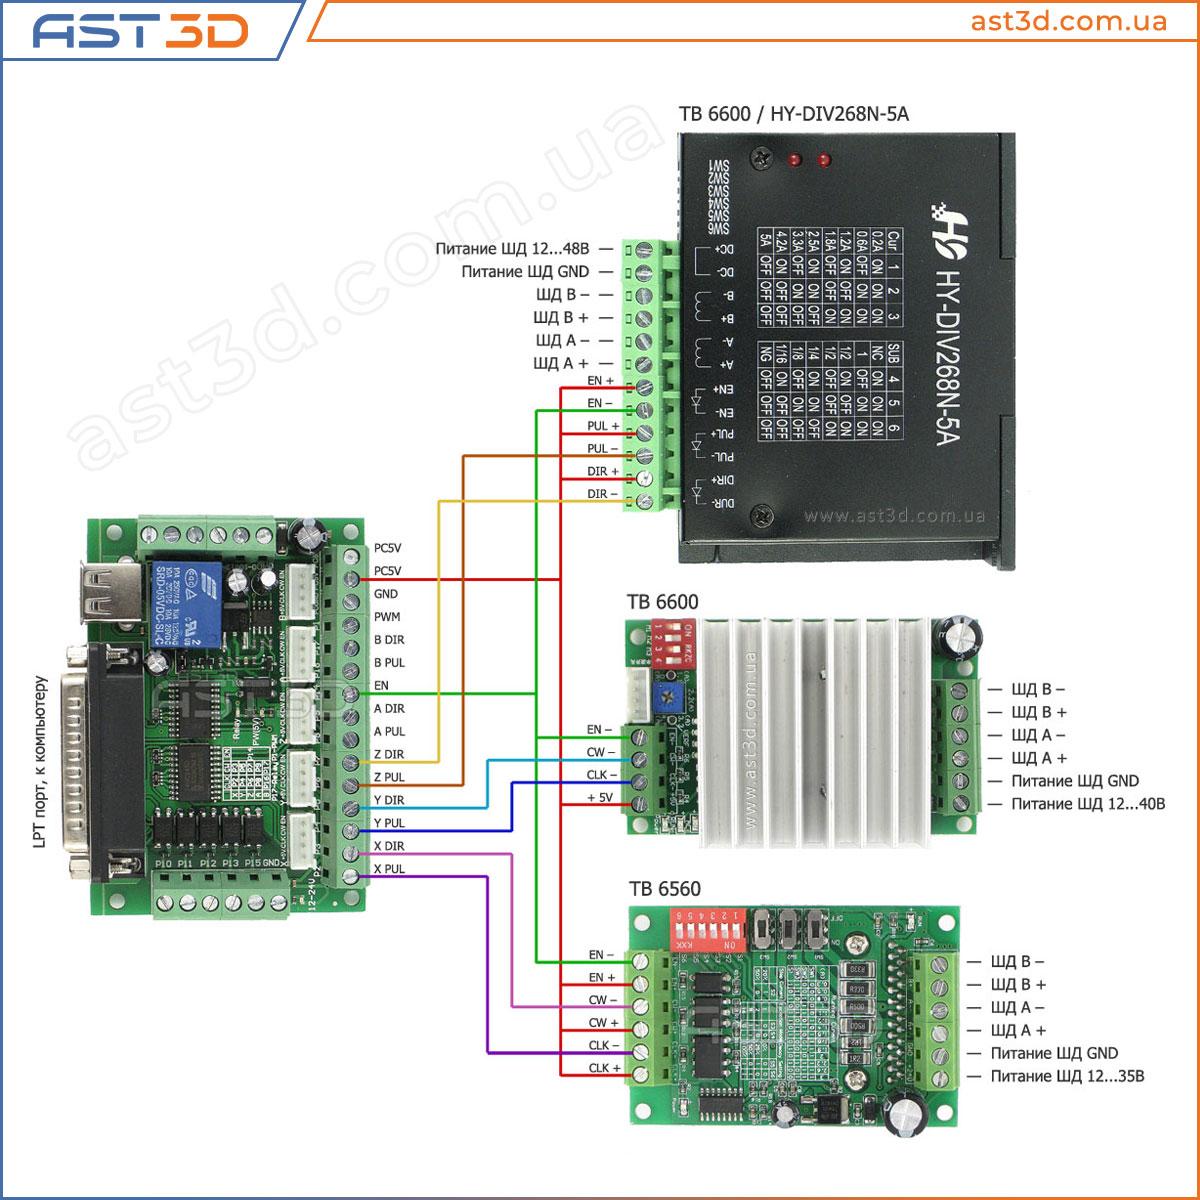 TB6600 подключение TB6560, HY-DIV268N-5A, скачать схему.